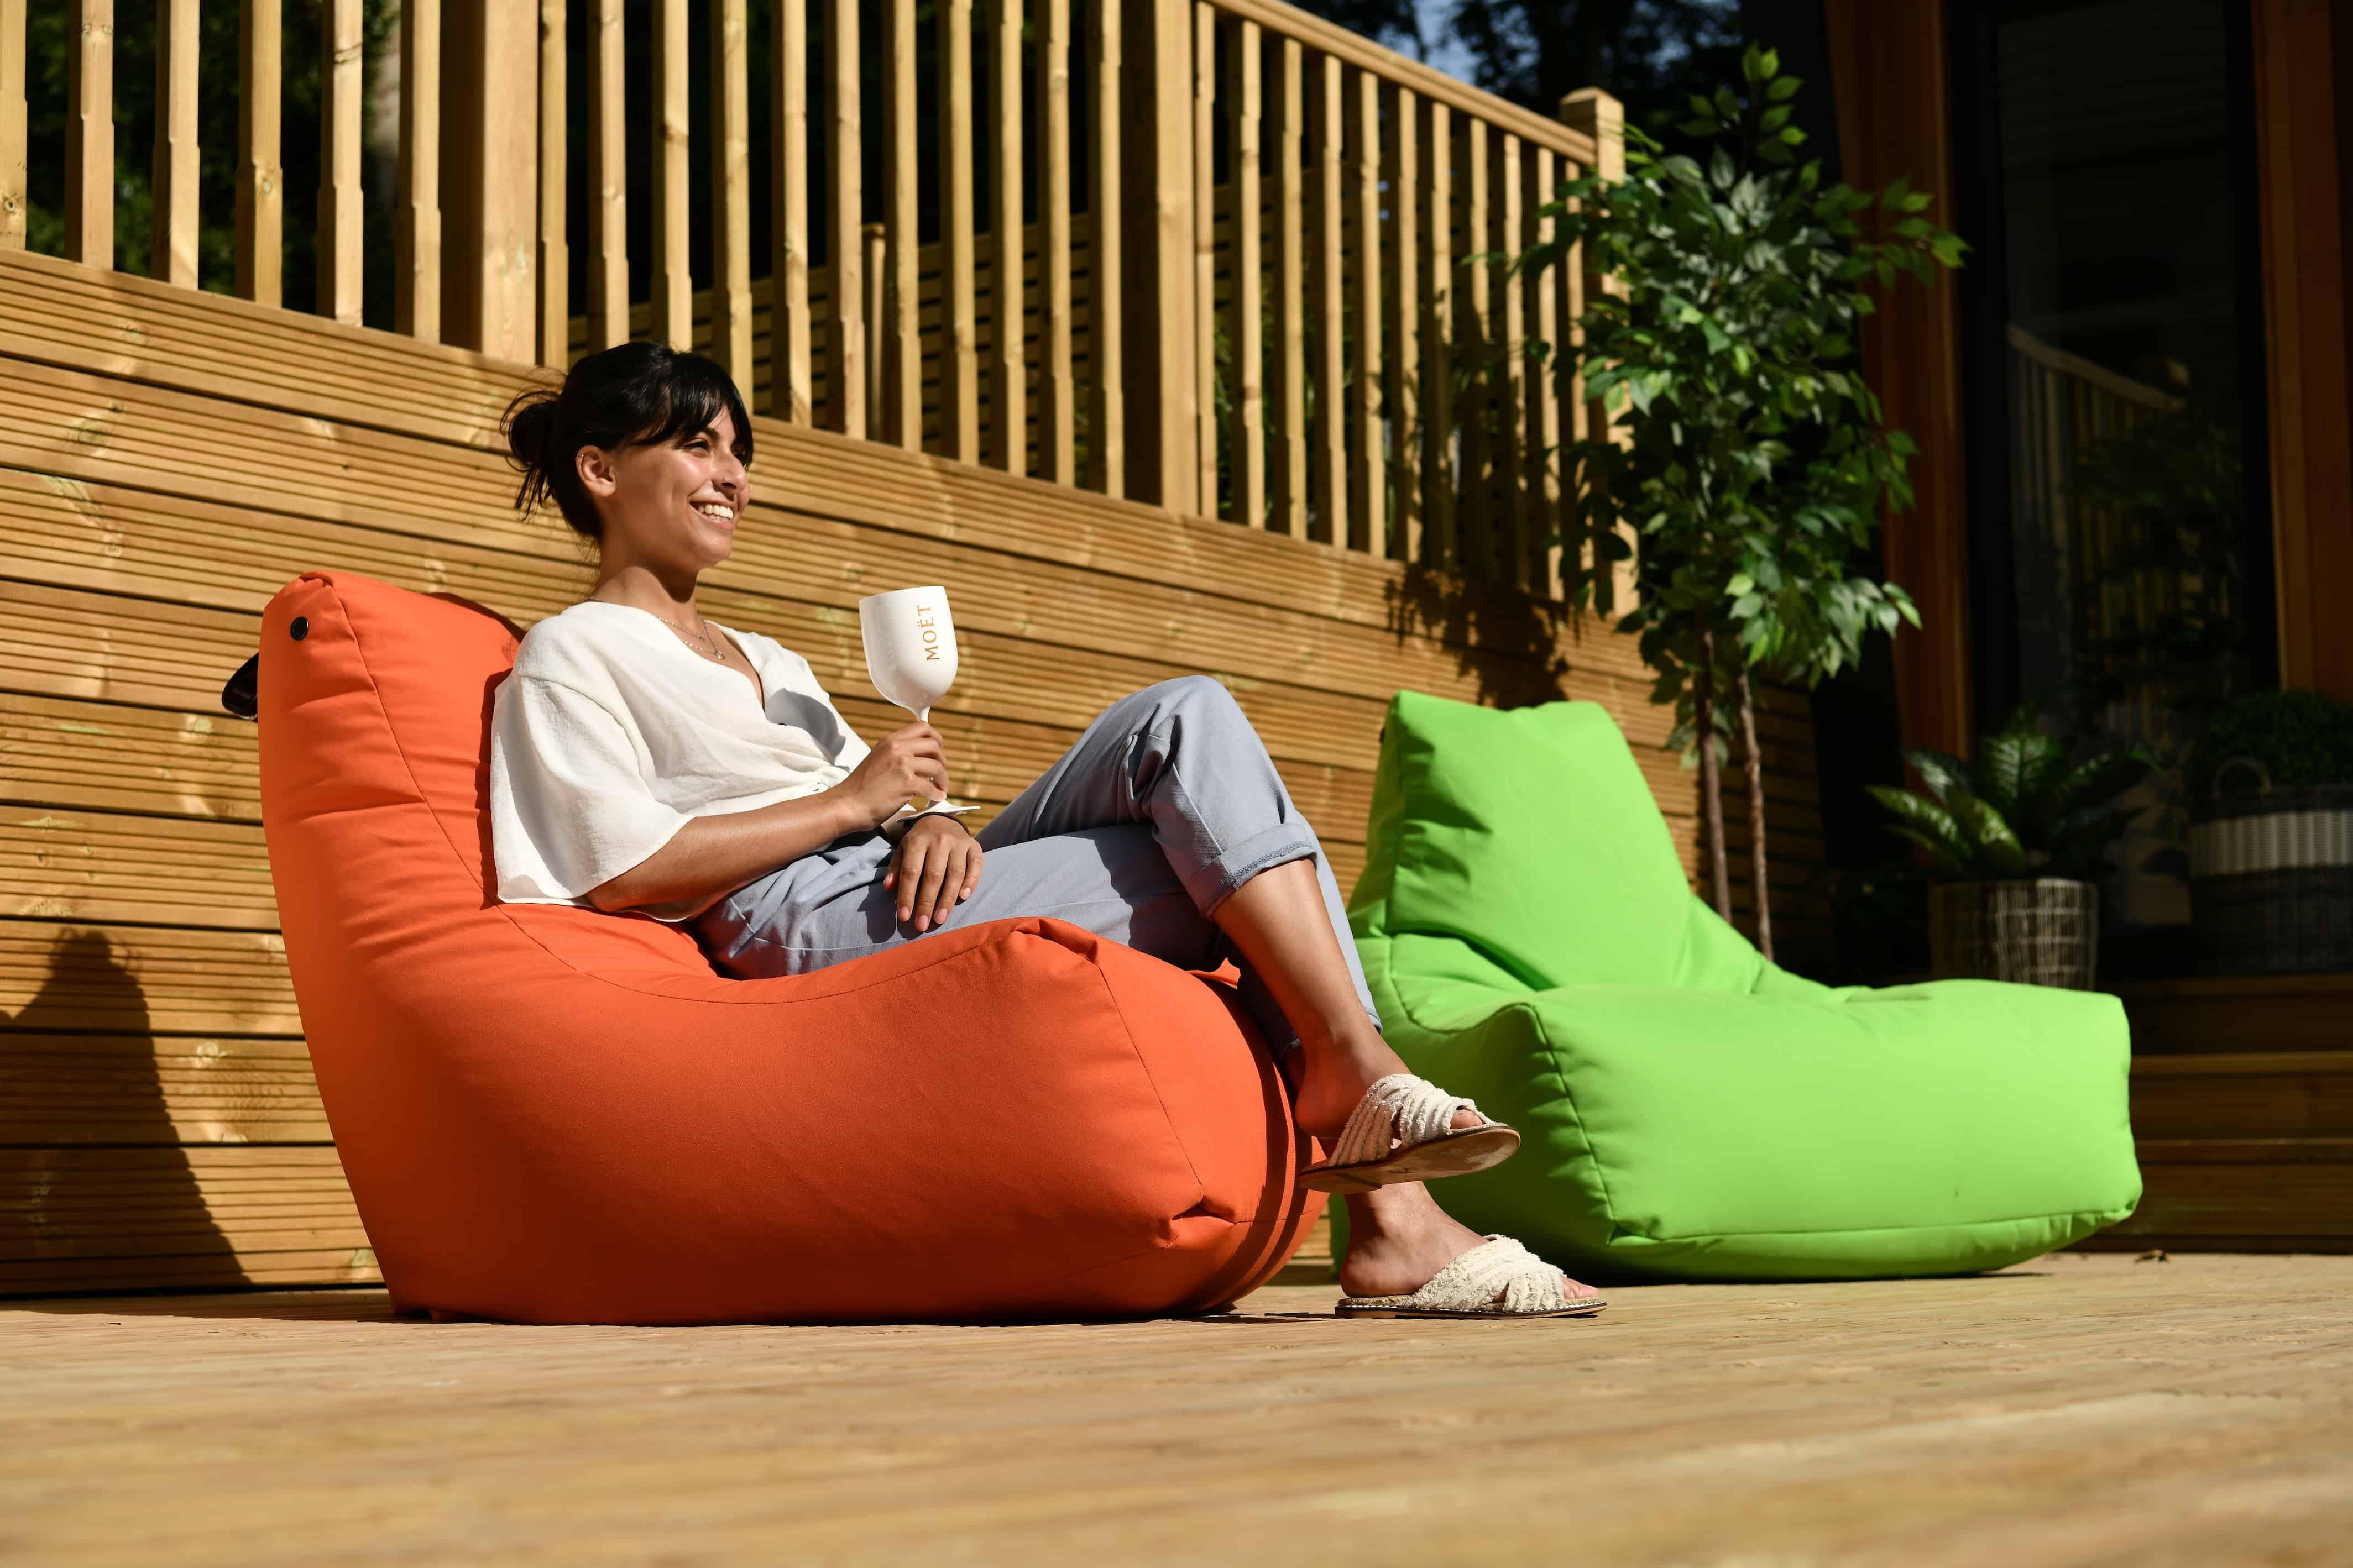 Remarkable Extreme Lounging Outdoor Bean Bag Orange Cjindustries Chair Design For Home Cjindustriesco